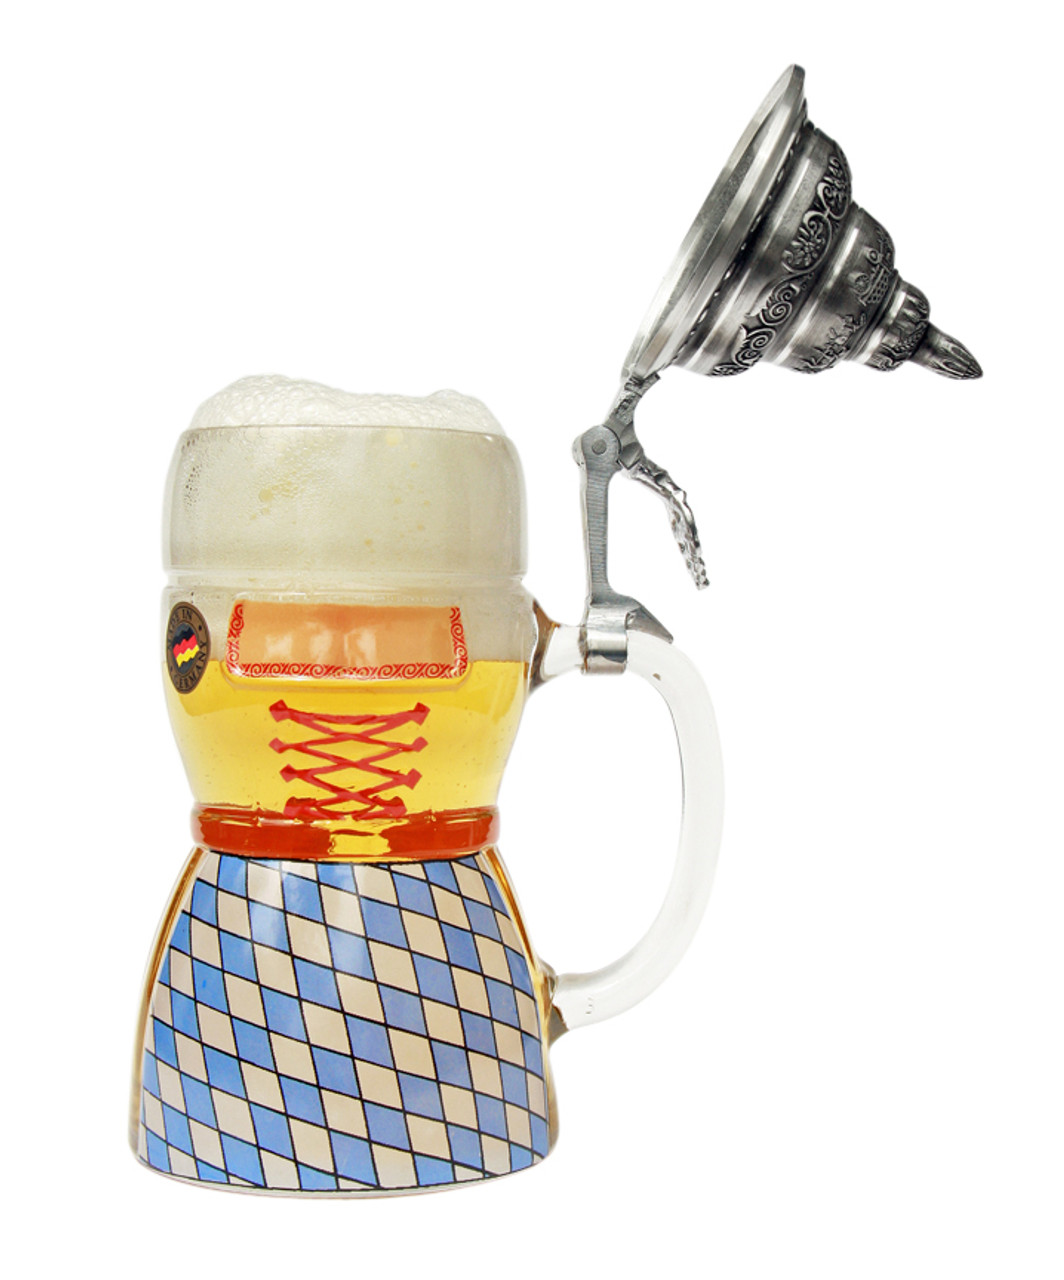 Collectible Beer Stein Full of German Beer